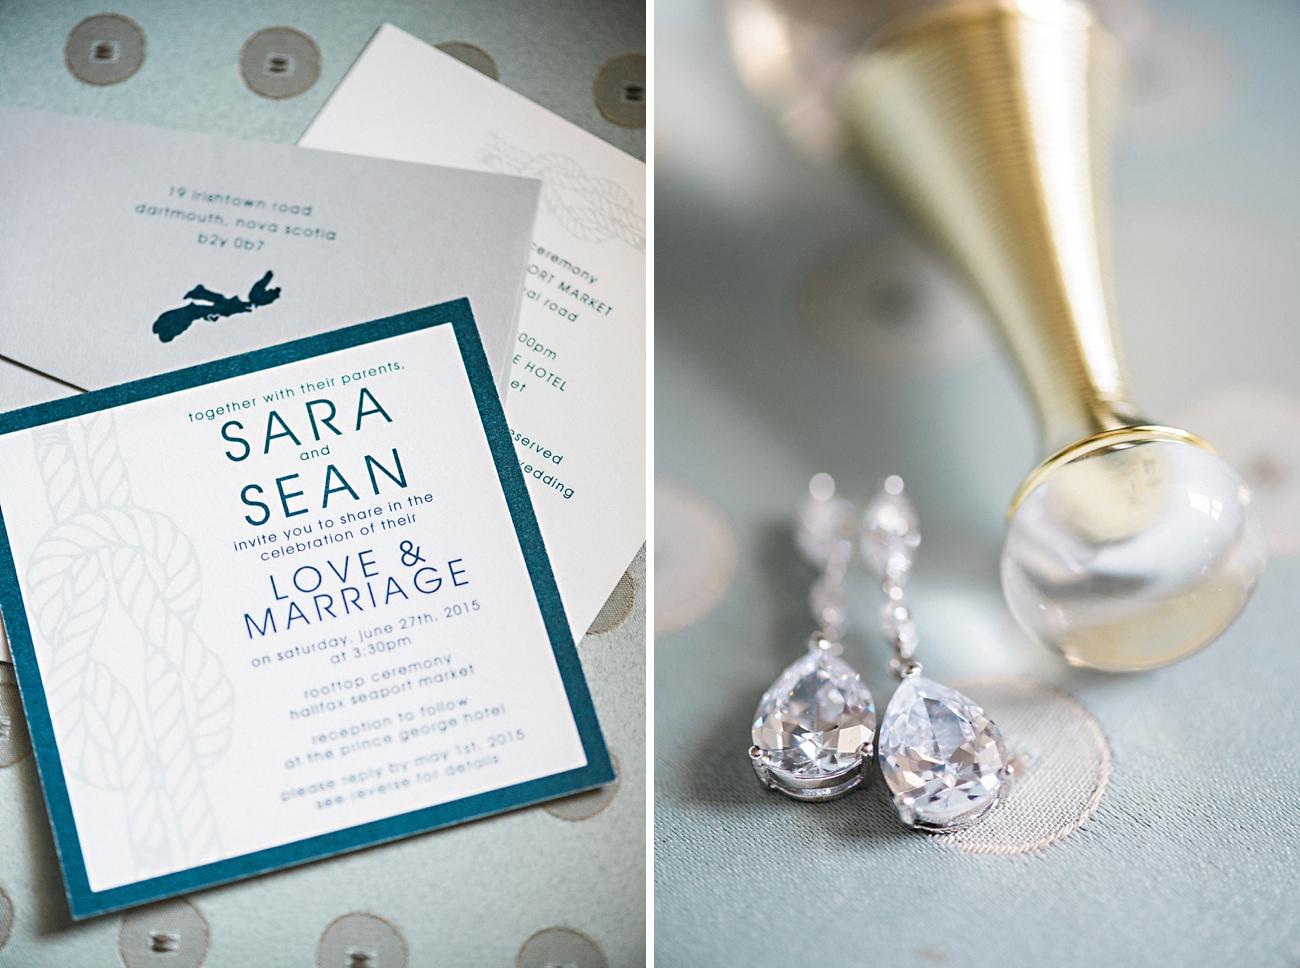 Sara-Seans-Halifax-Prince-George-Hotel-Wedding012.jpg